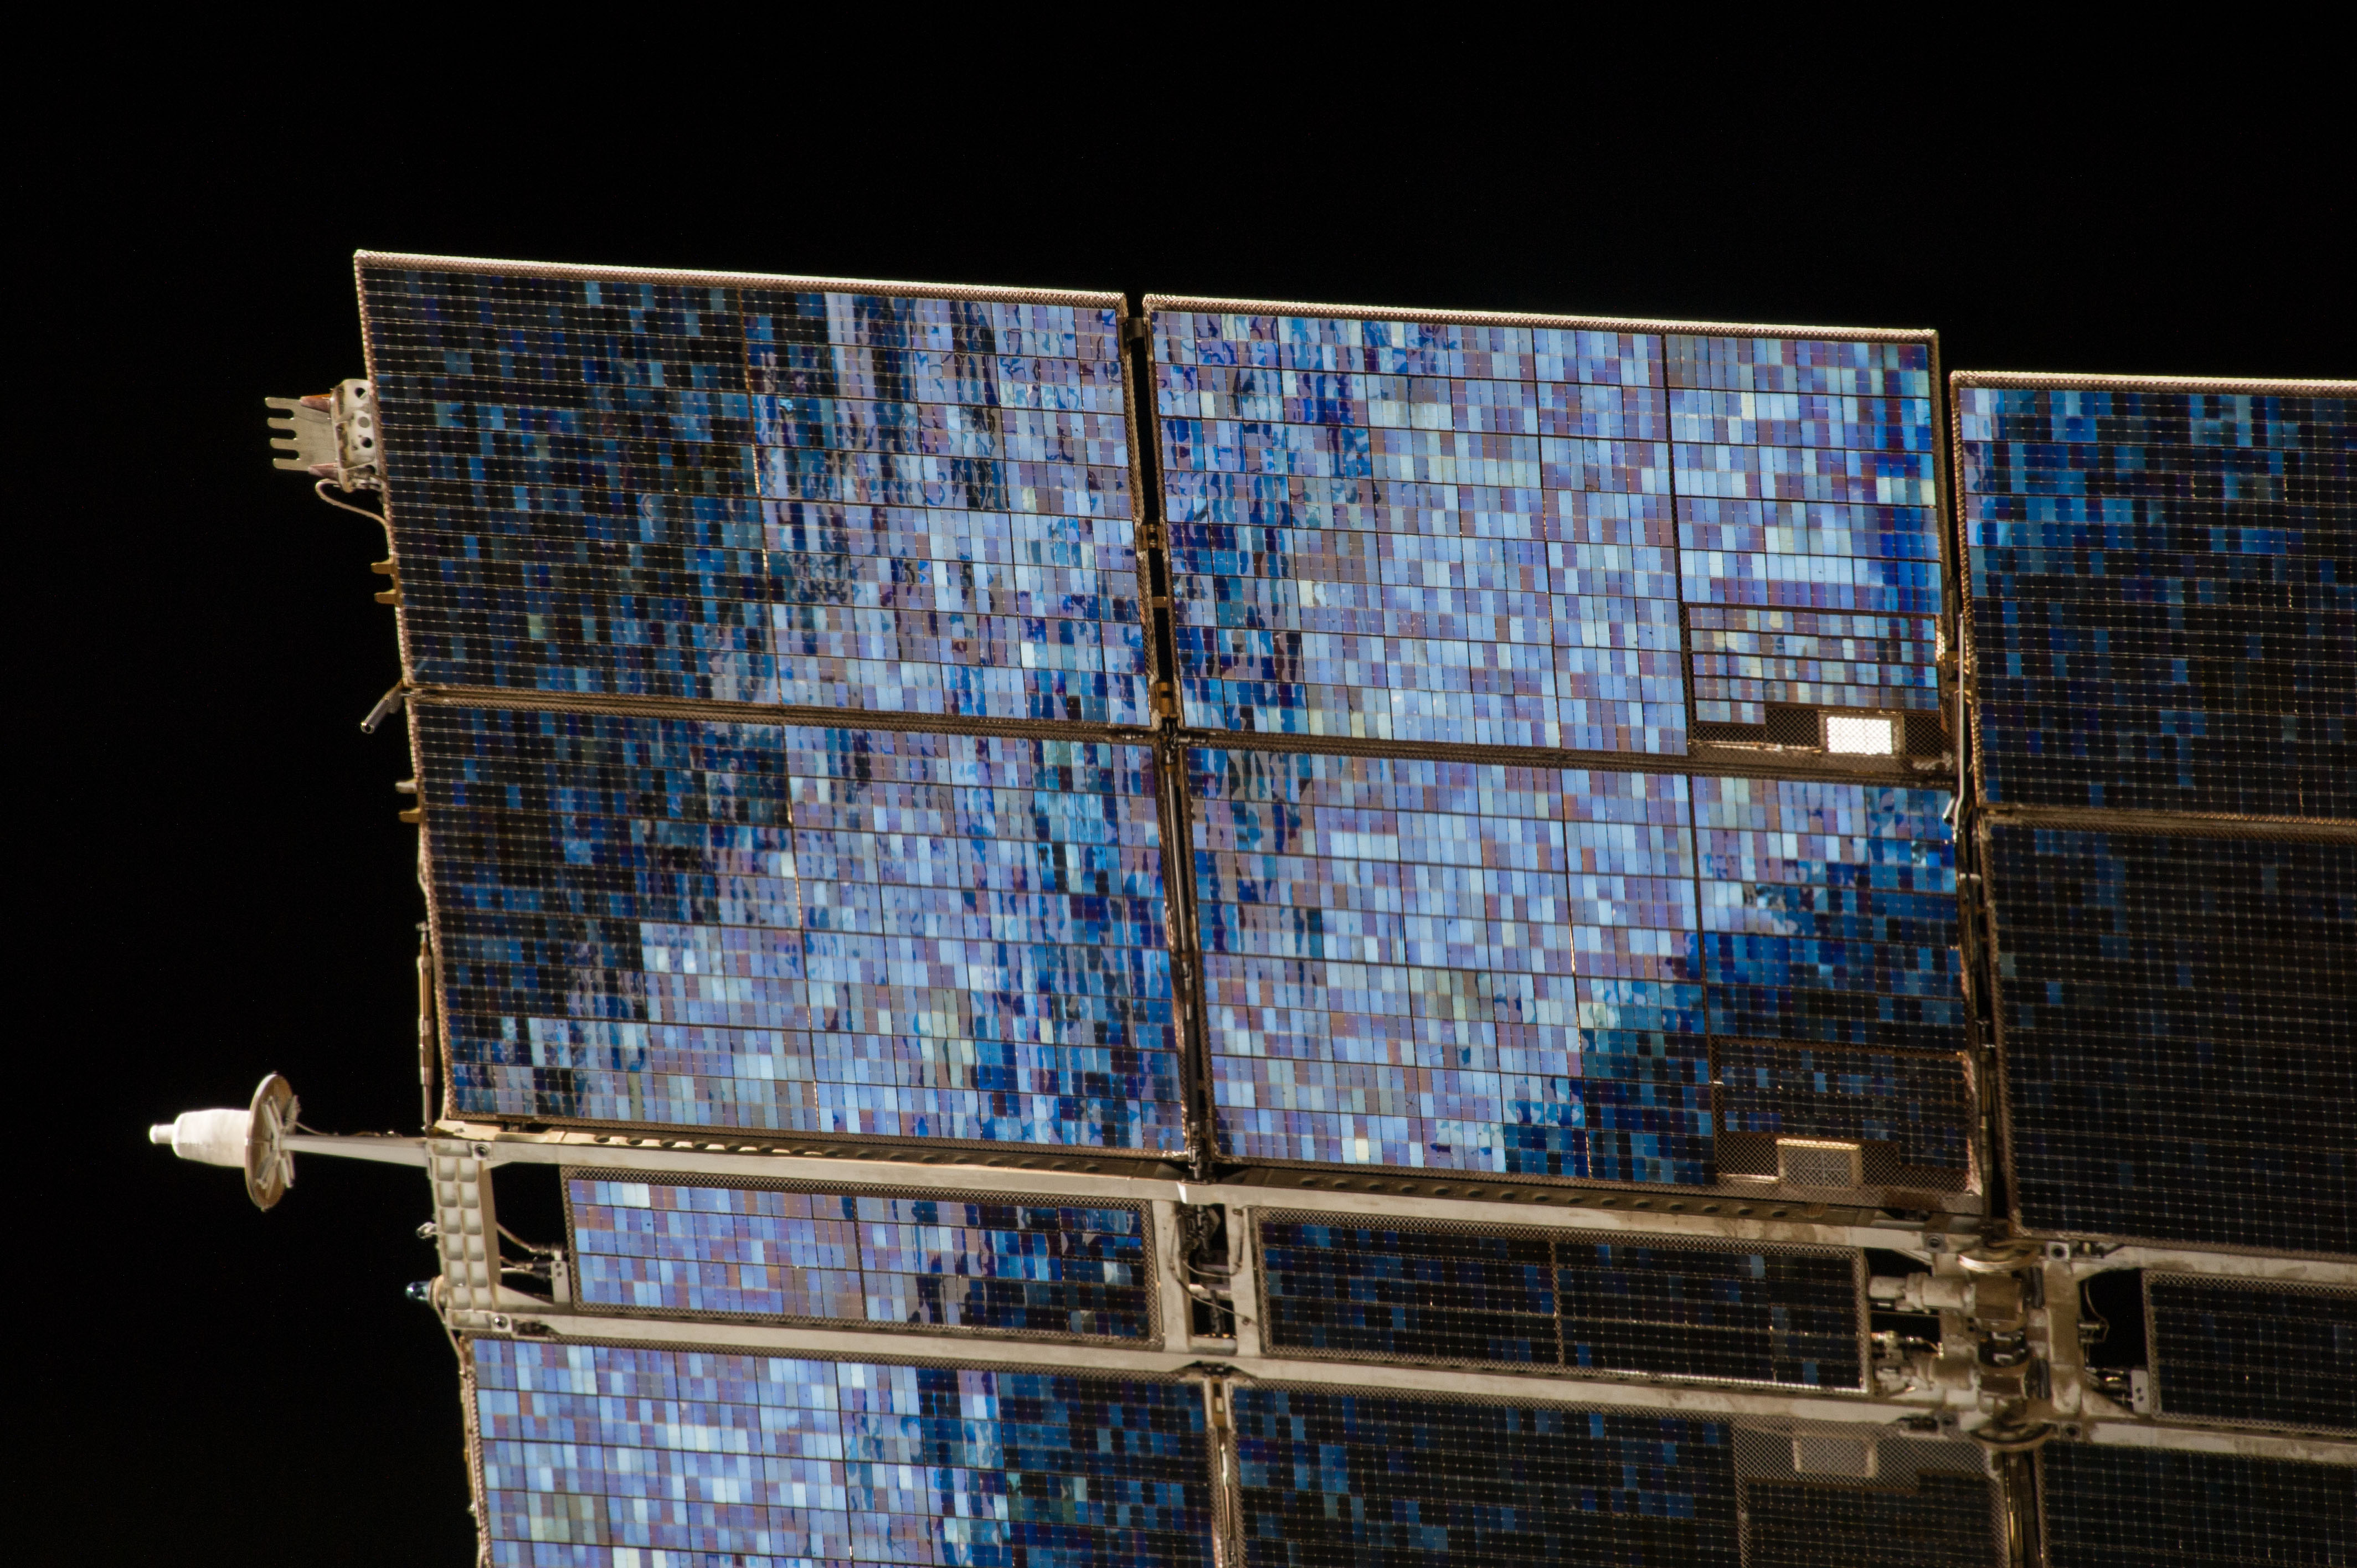 spacecraft solar array panels - photo #22